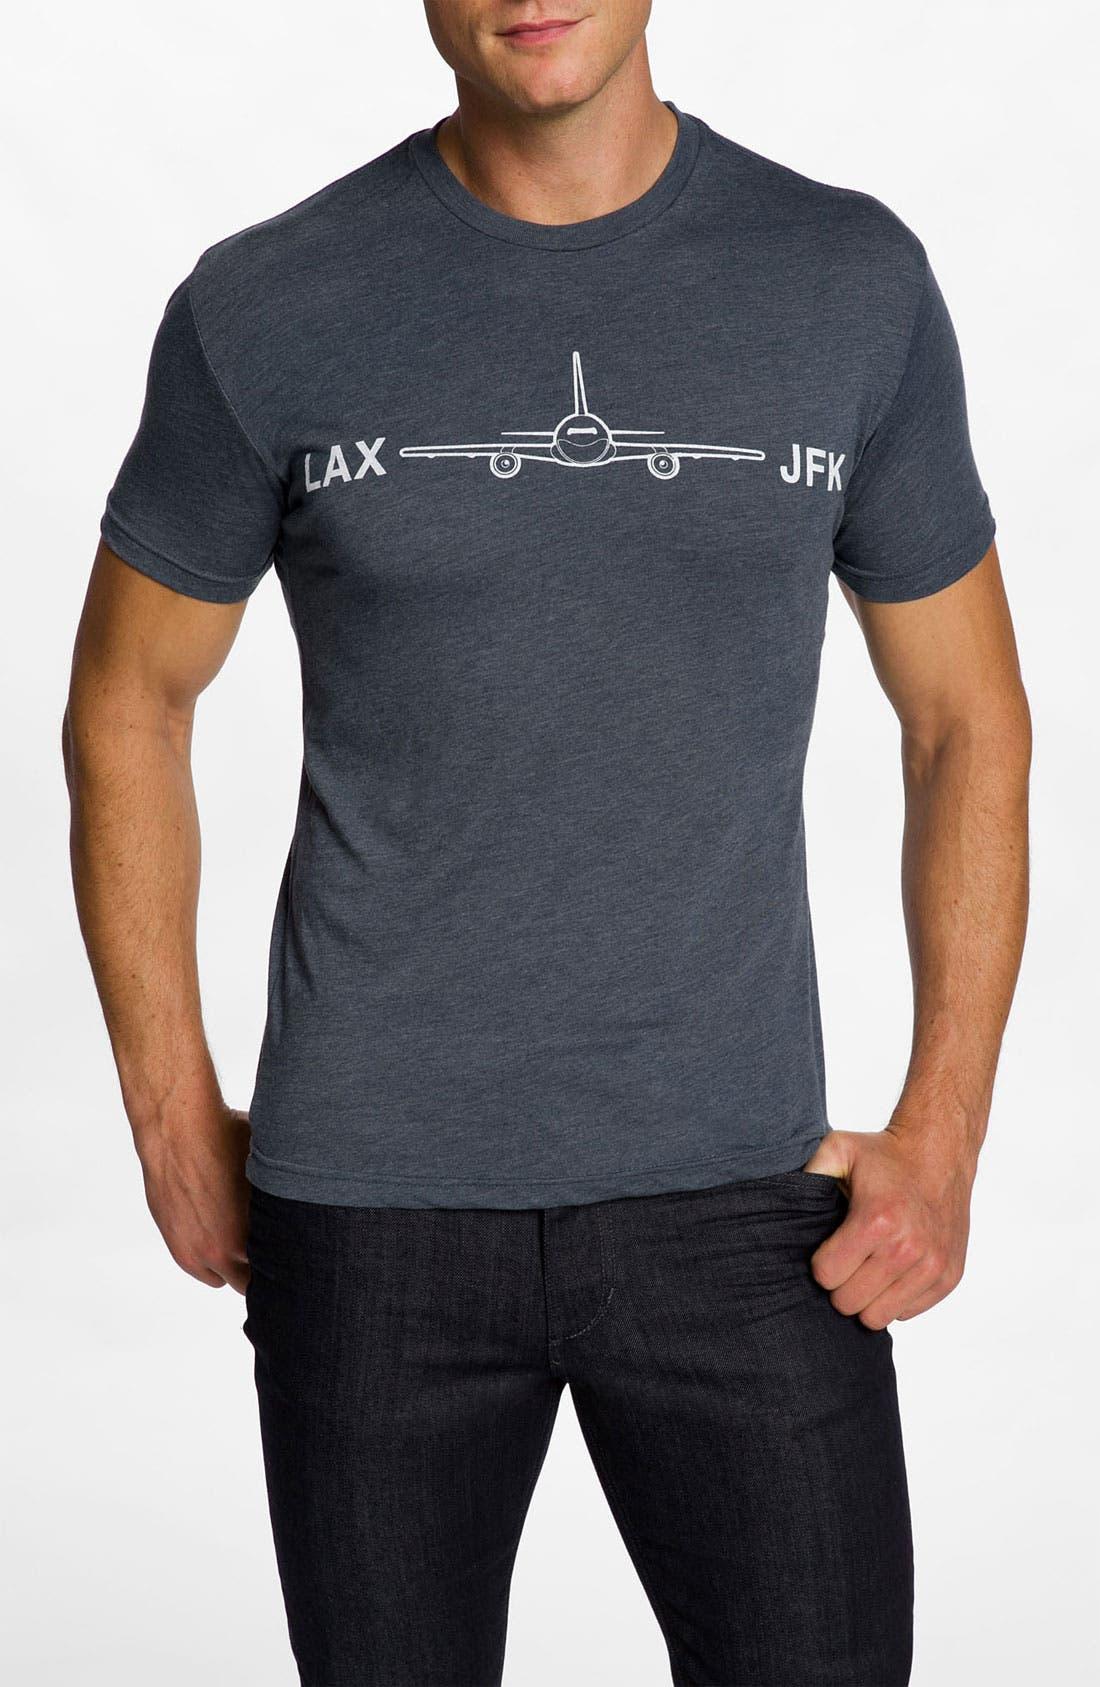 Alternate Image 1 Selected - DiLascia 'LAX - JFK' T-Shirt